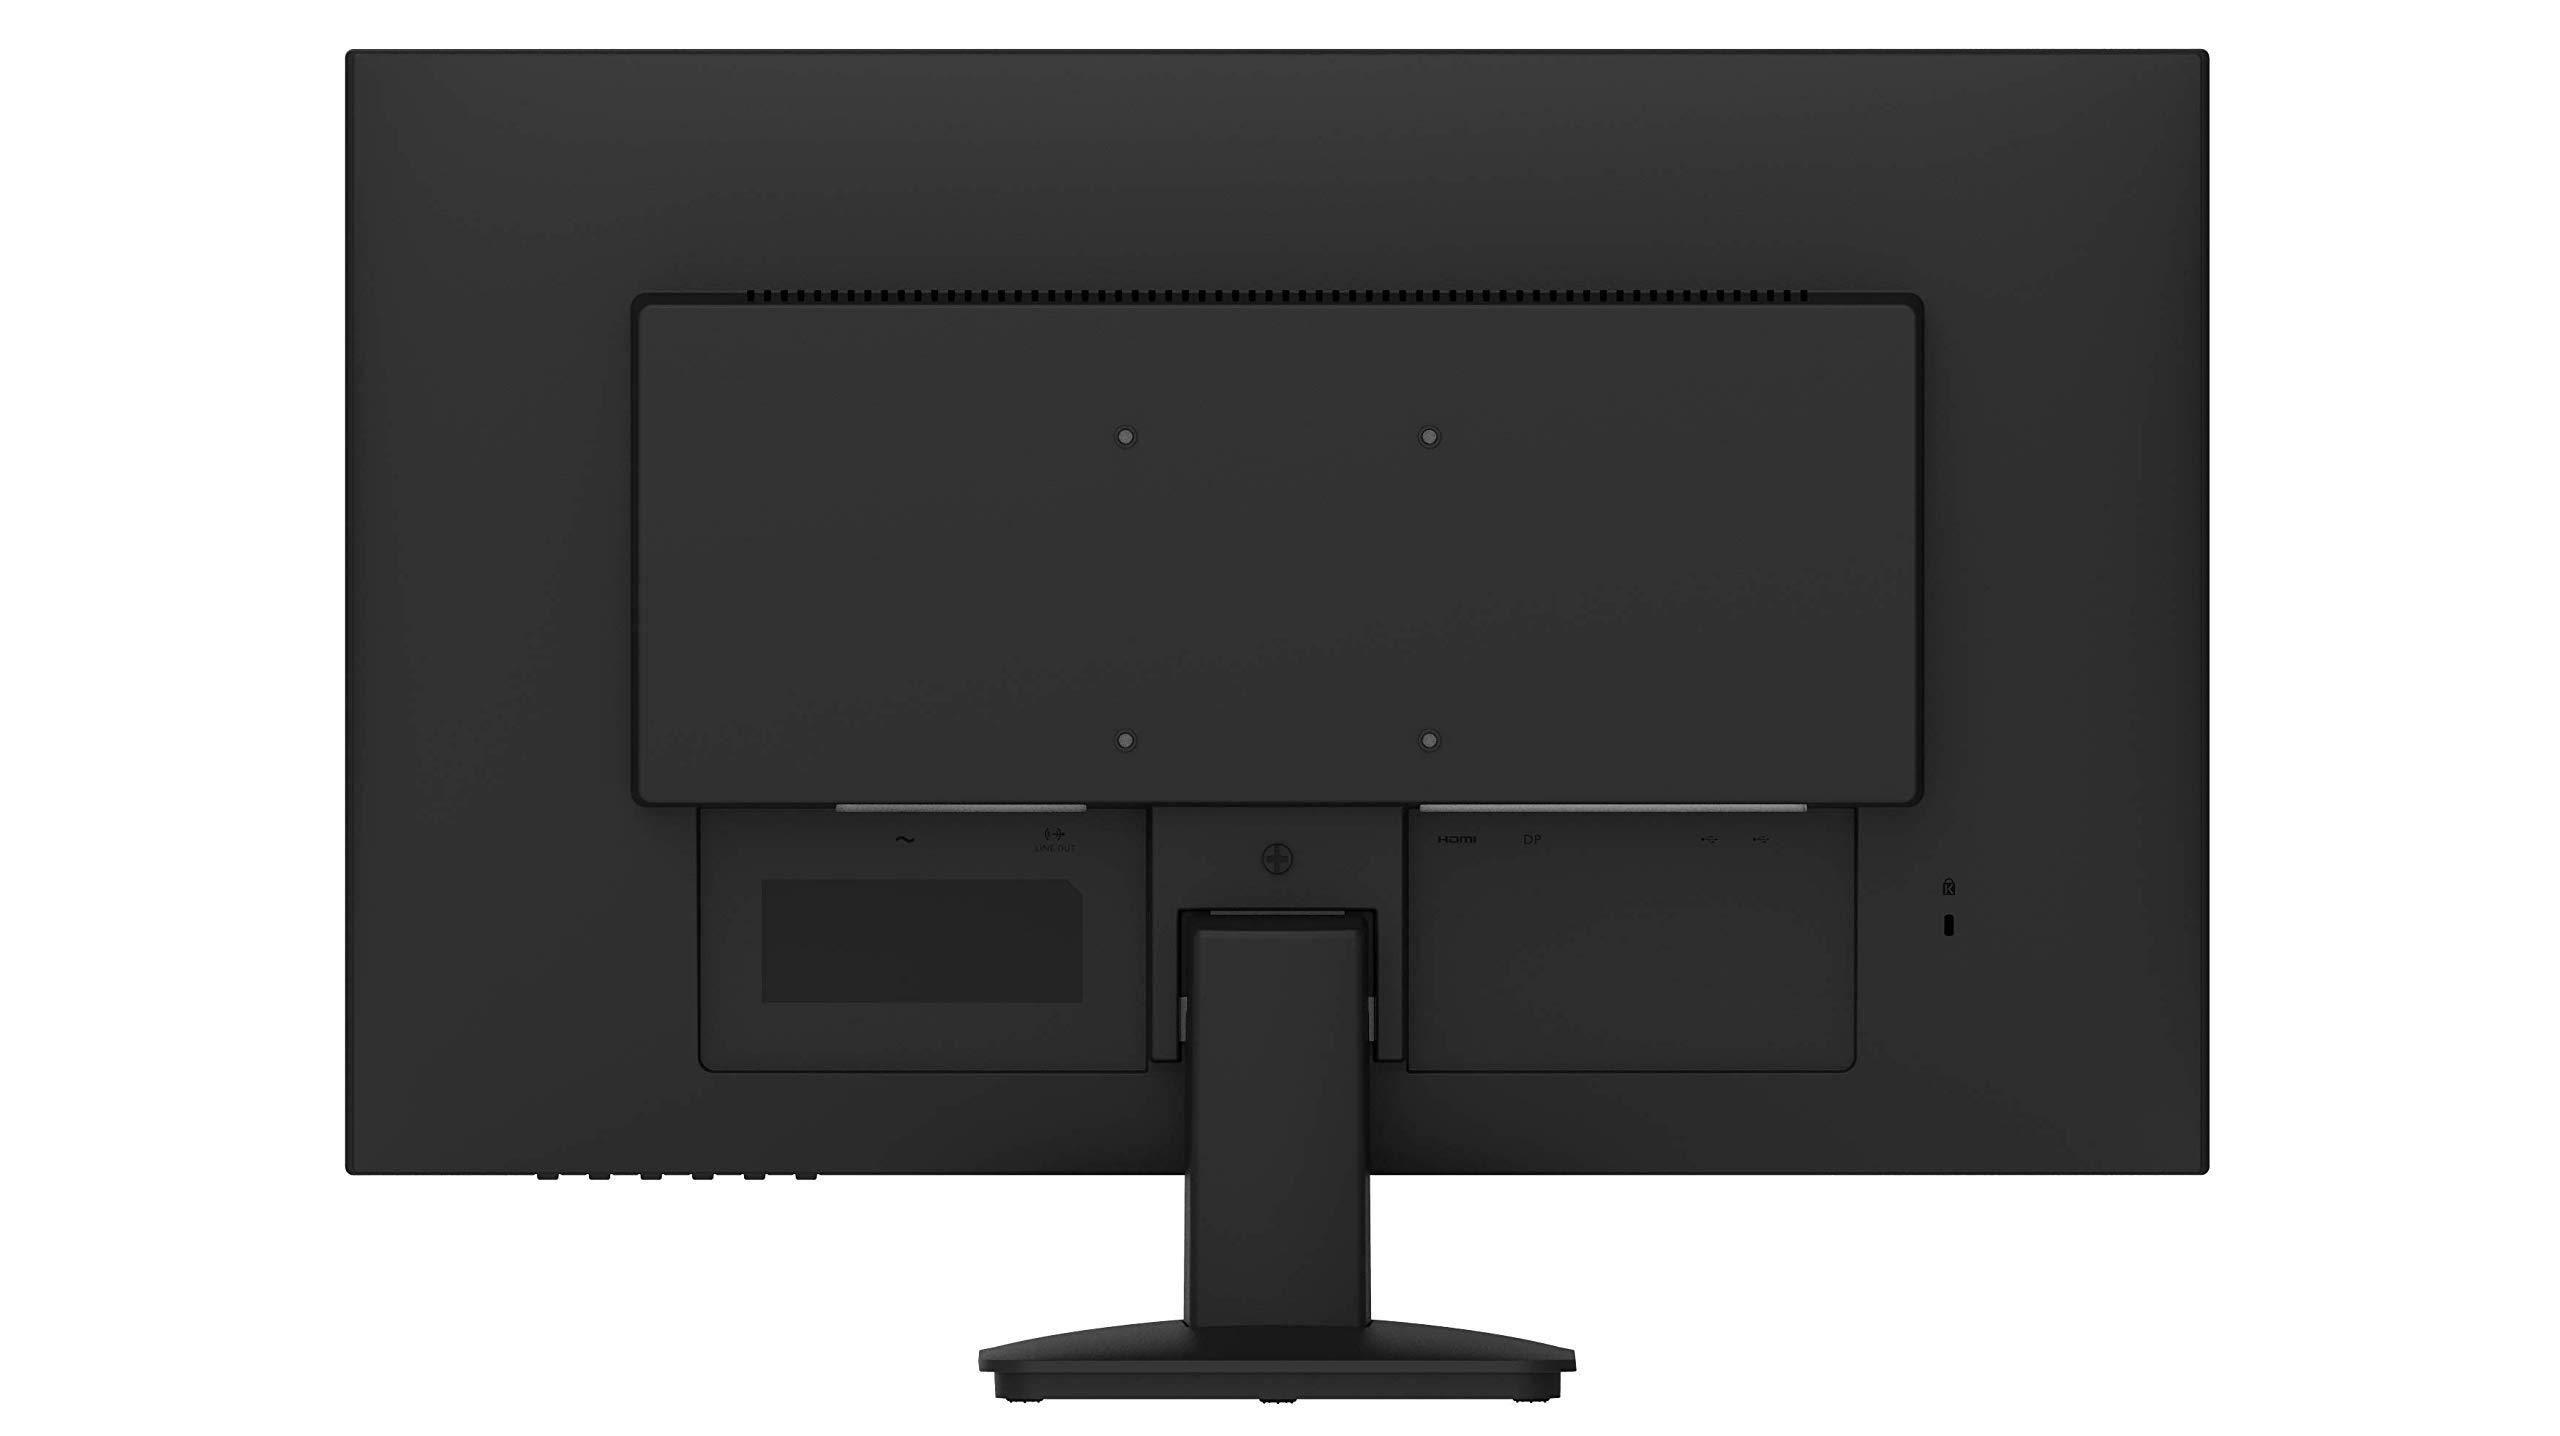 "Dell Gaming LED-Lit Monitor 27"" Black (D2719HGF), FHD (1920 x 1080) at 144 Hz, 2 ms response time, DP 1.2, HDMI, USB, 2W x 2 speakers, AMD FreeSync 2"